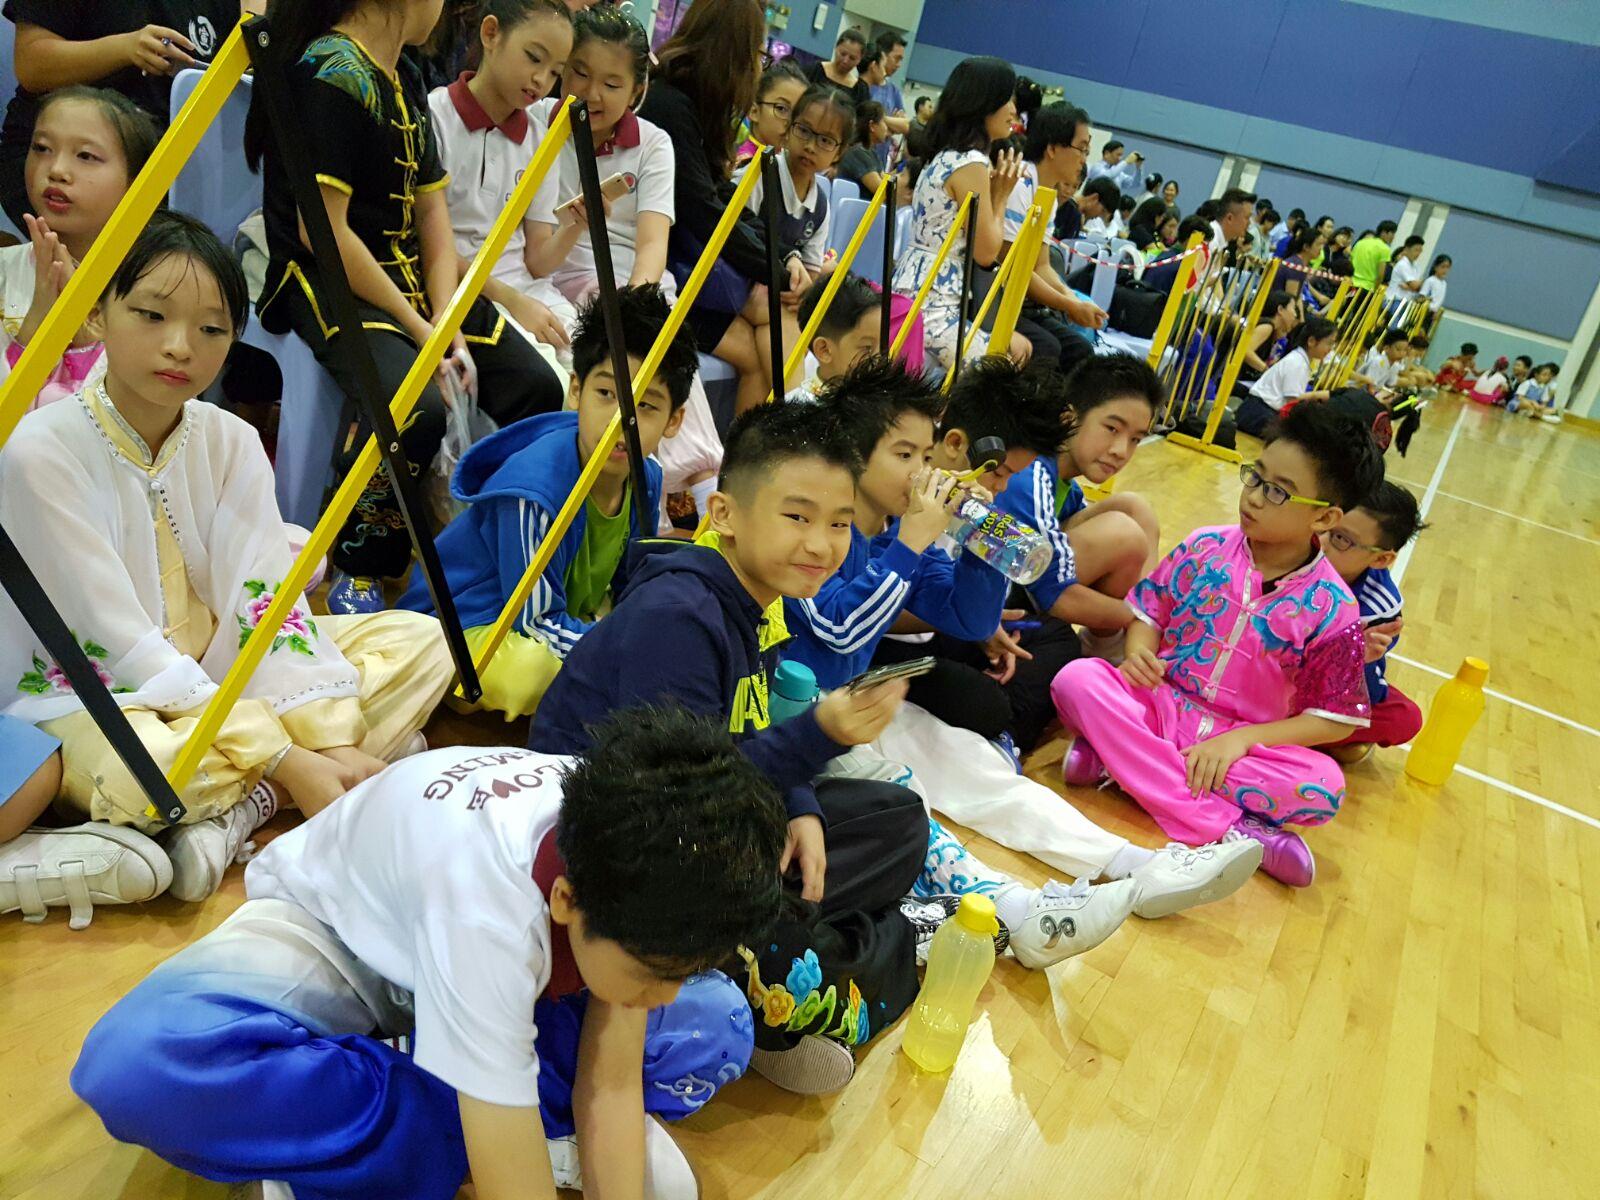 Xuan Sports' ardent cheerleaders